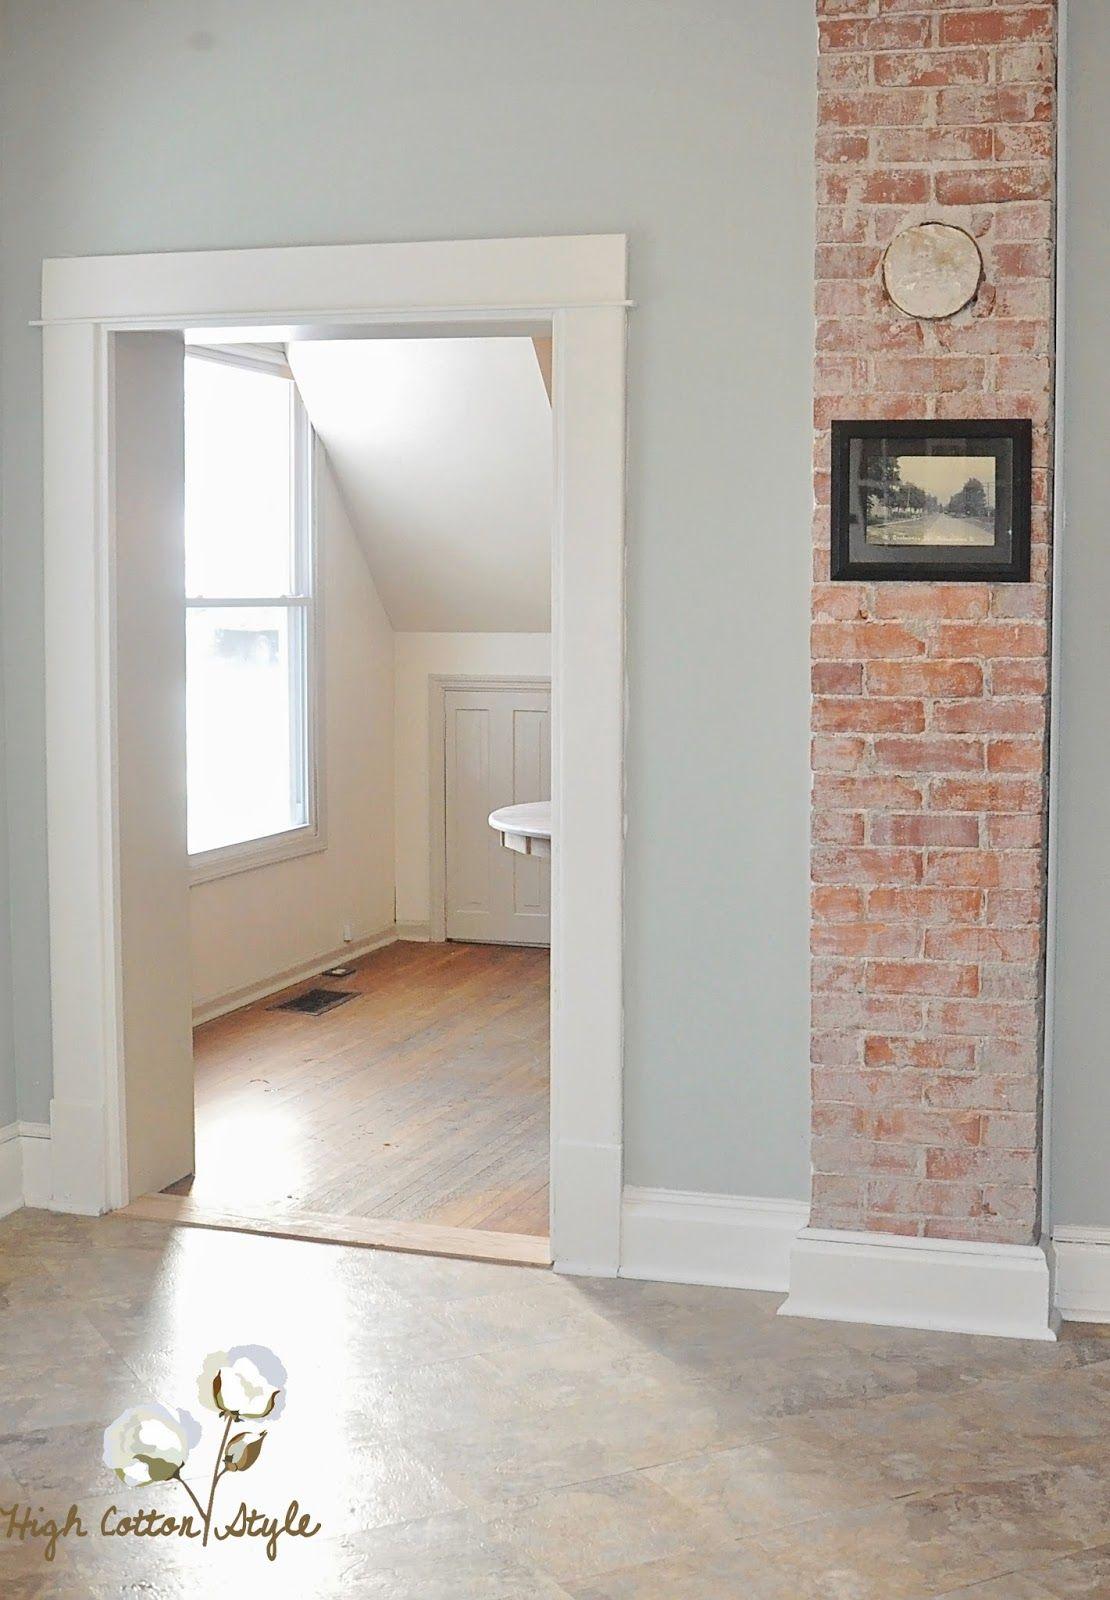 Frostwork favorite paint colors home sweet home dormitorio pinterest pintura paredes - Pintura color ladrillo ...